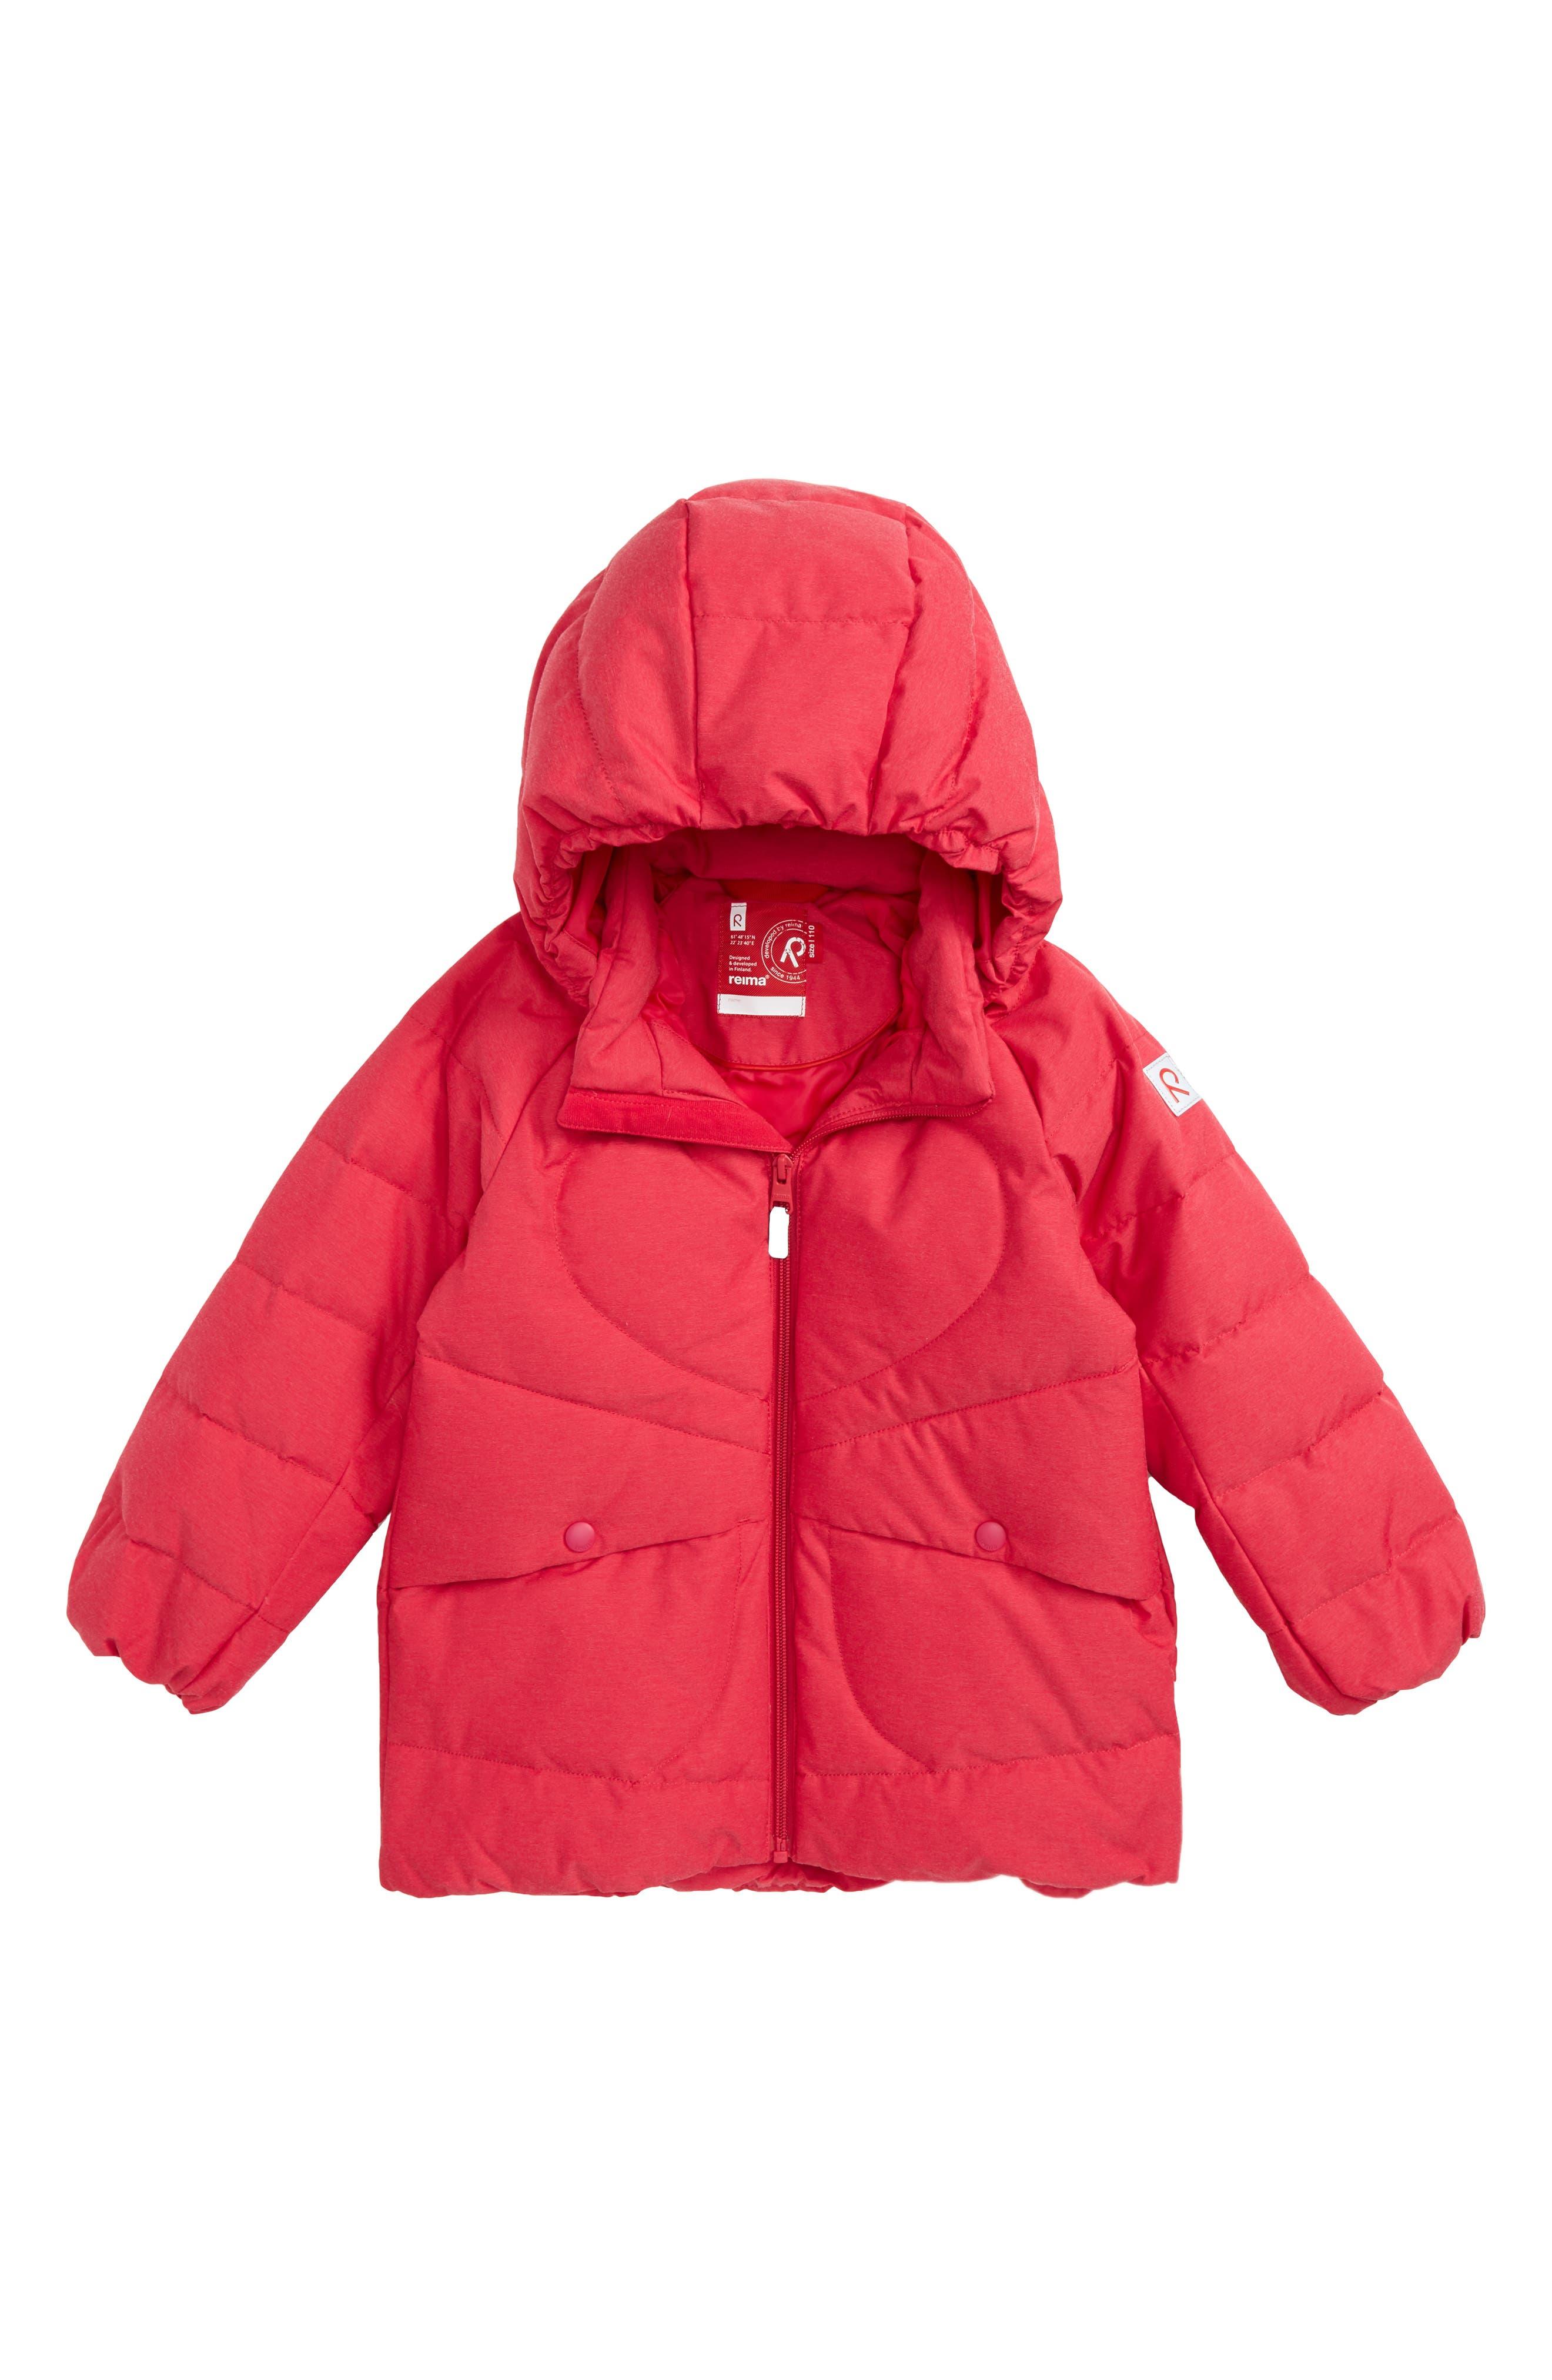 Main Image - Reima Loiste Water Repellent Hooded Down Jacket (Toddler Girls & Little Girls)